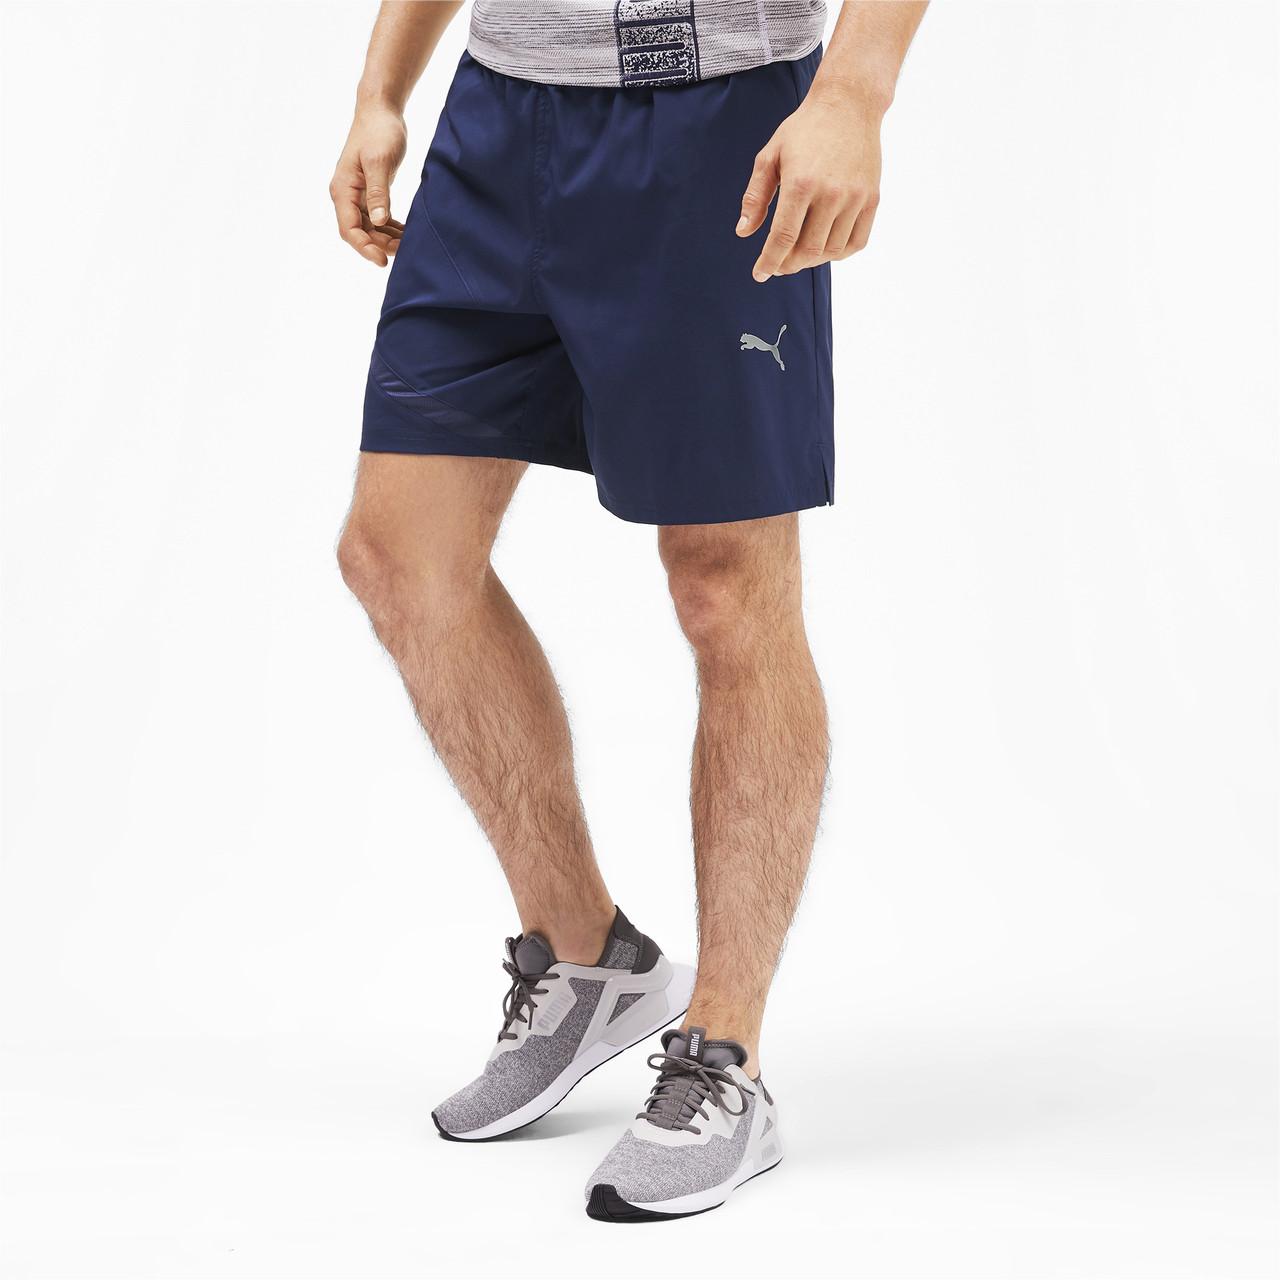 Шорты мужские IGNITE Woven Men's Training Shorts